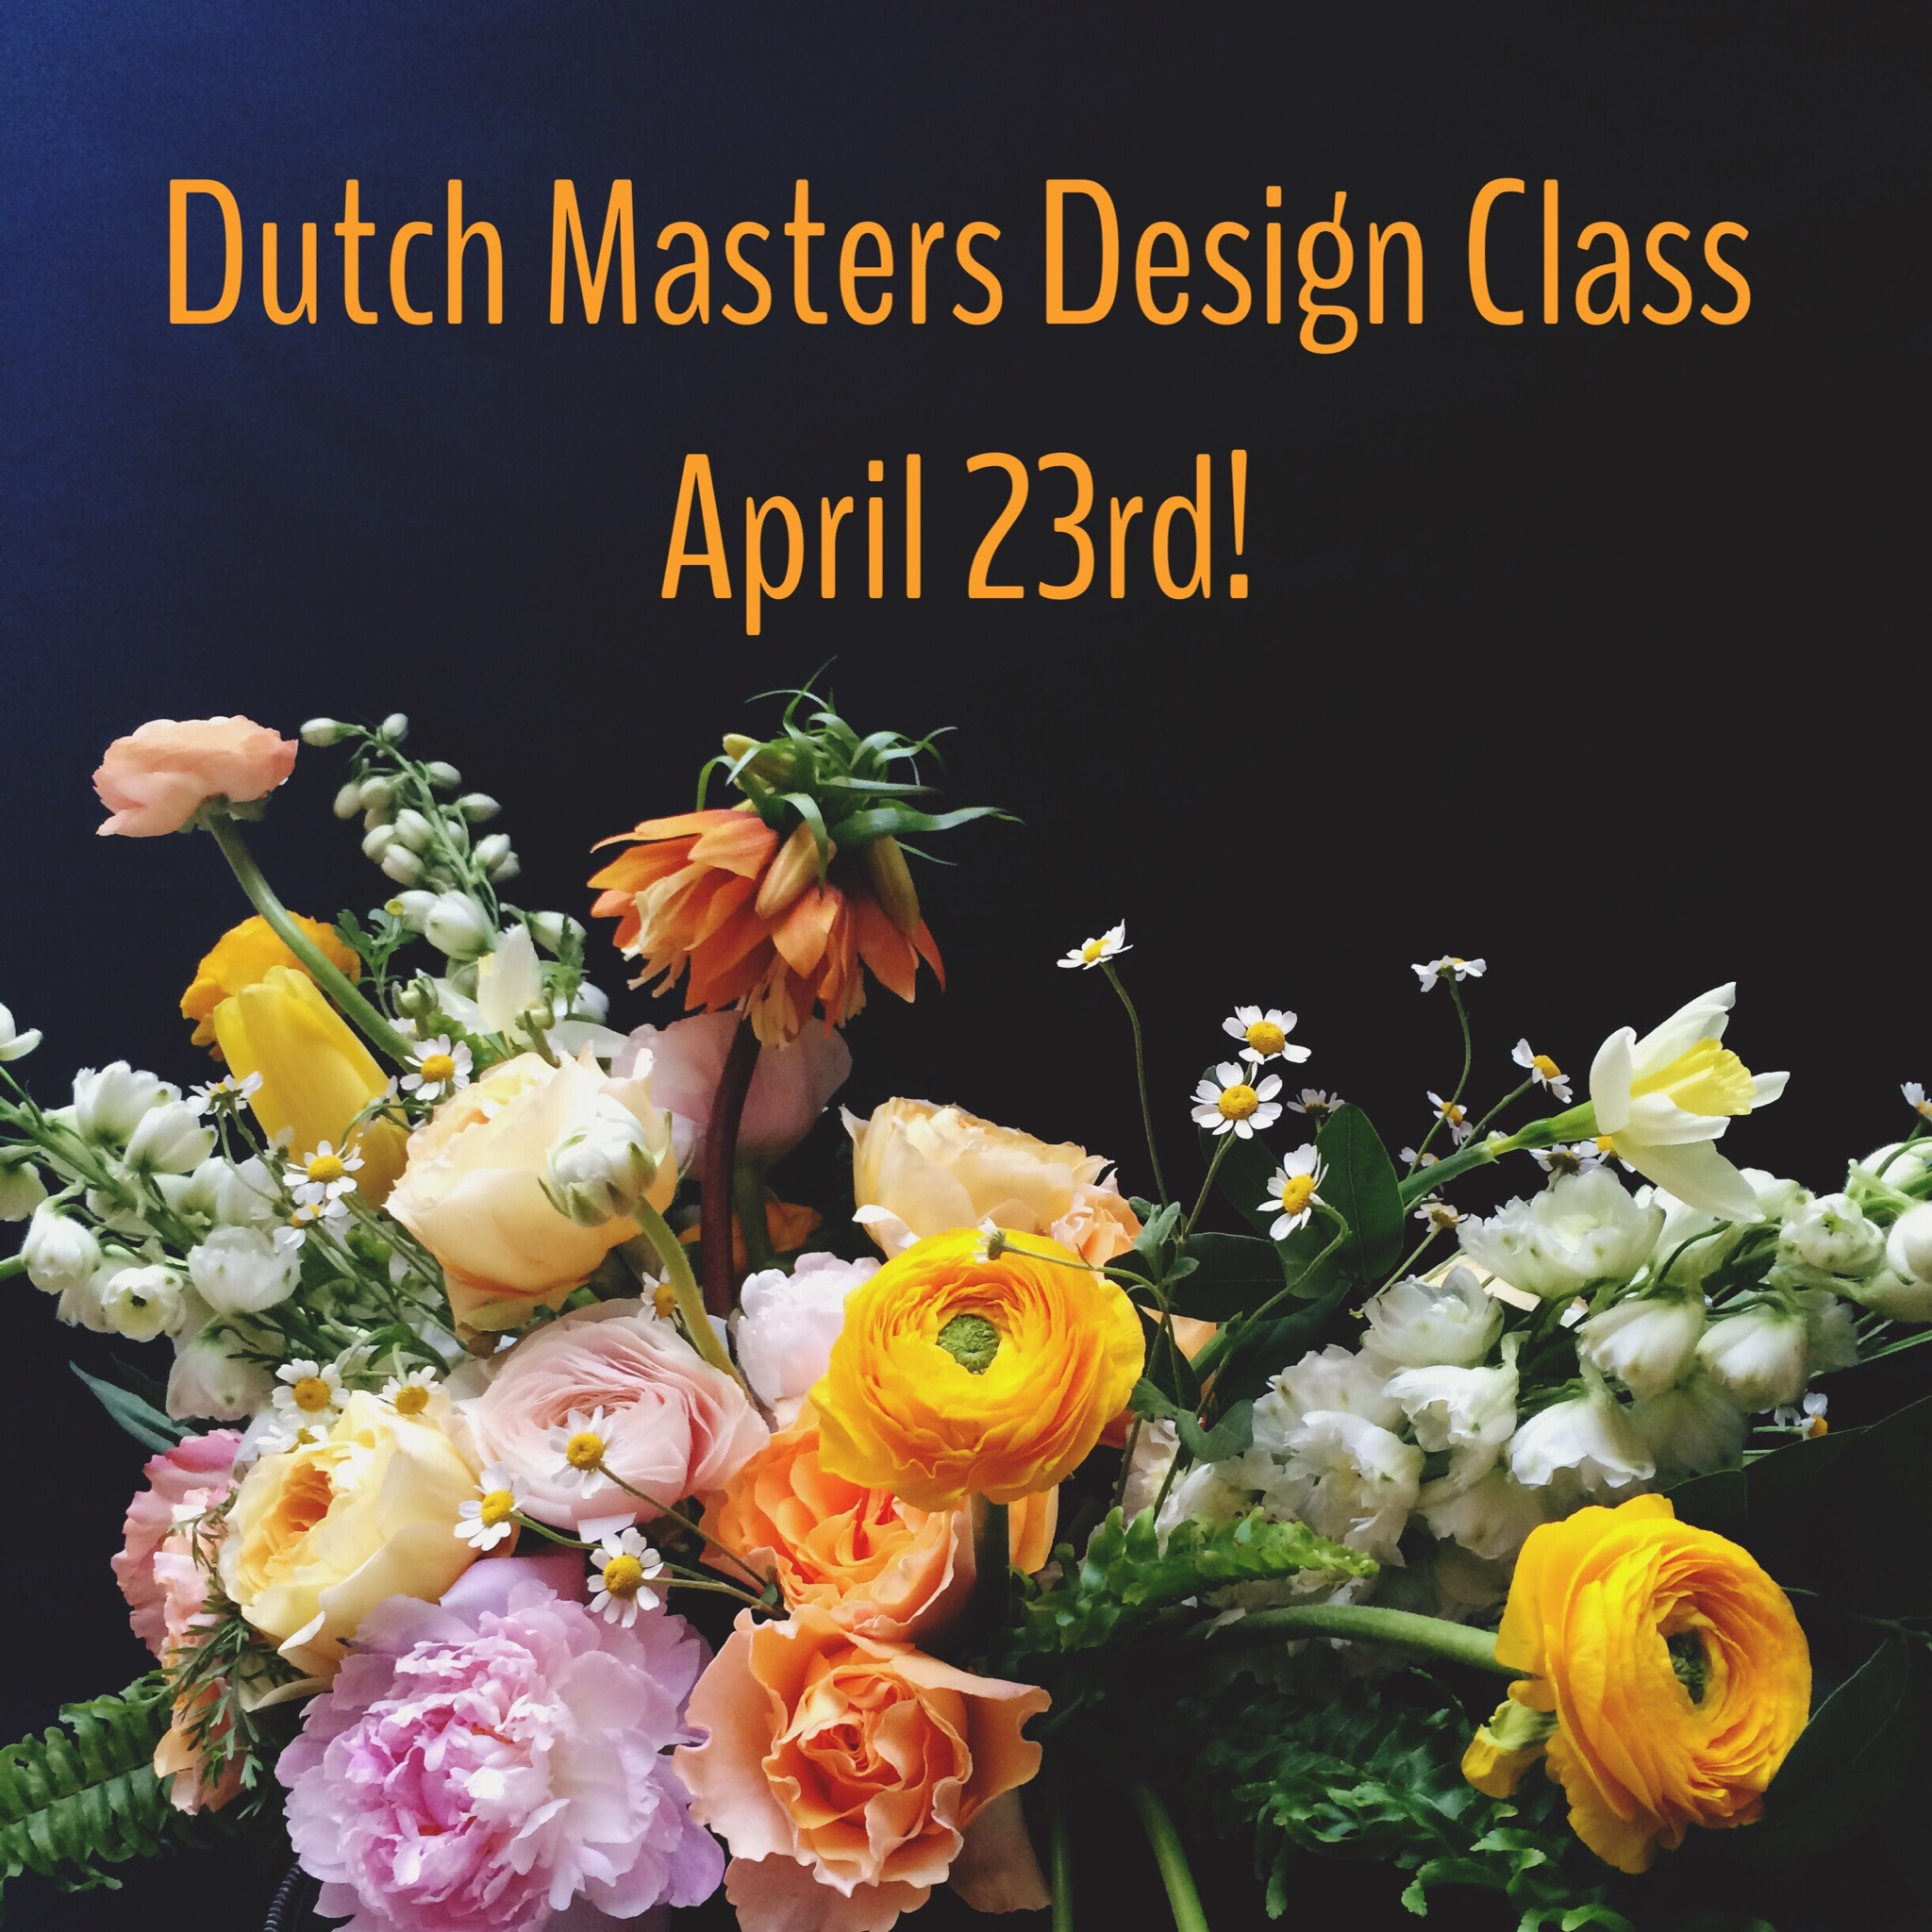 Dutch Masters Design Class with Fleur Inc